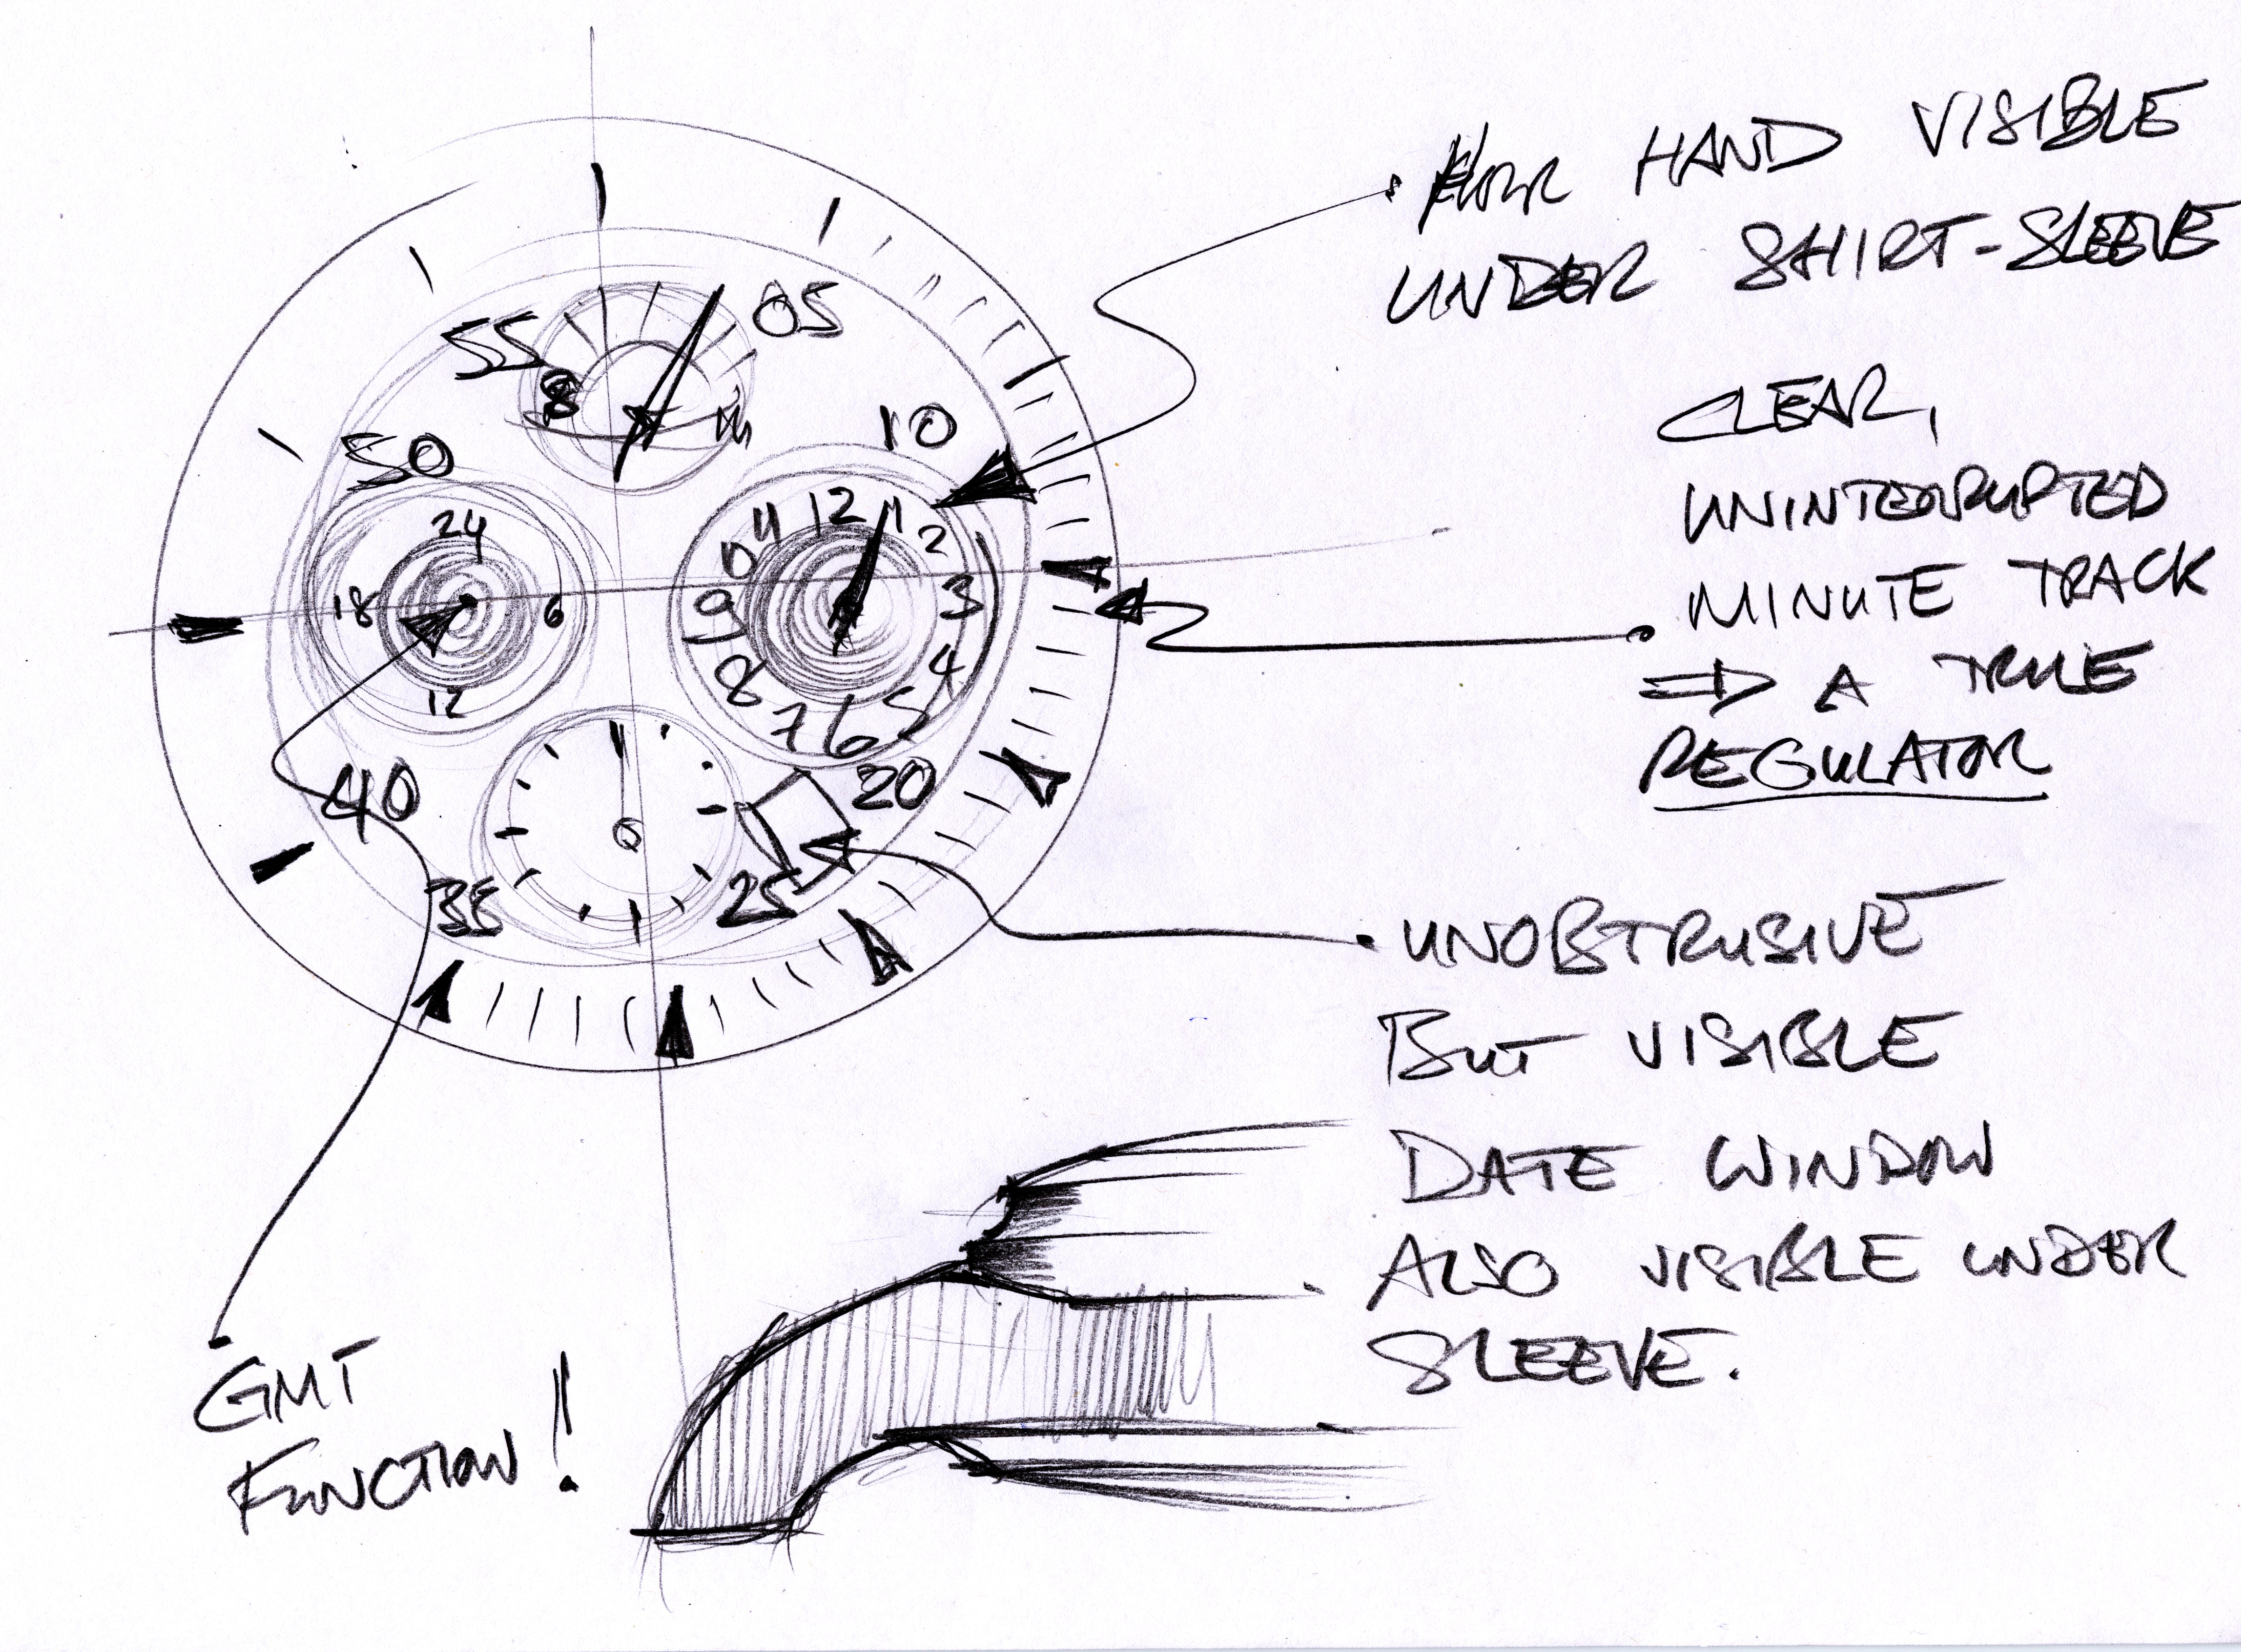 L.U.C Regulator - Sketch